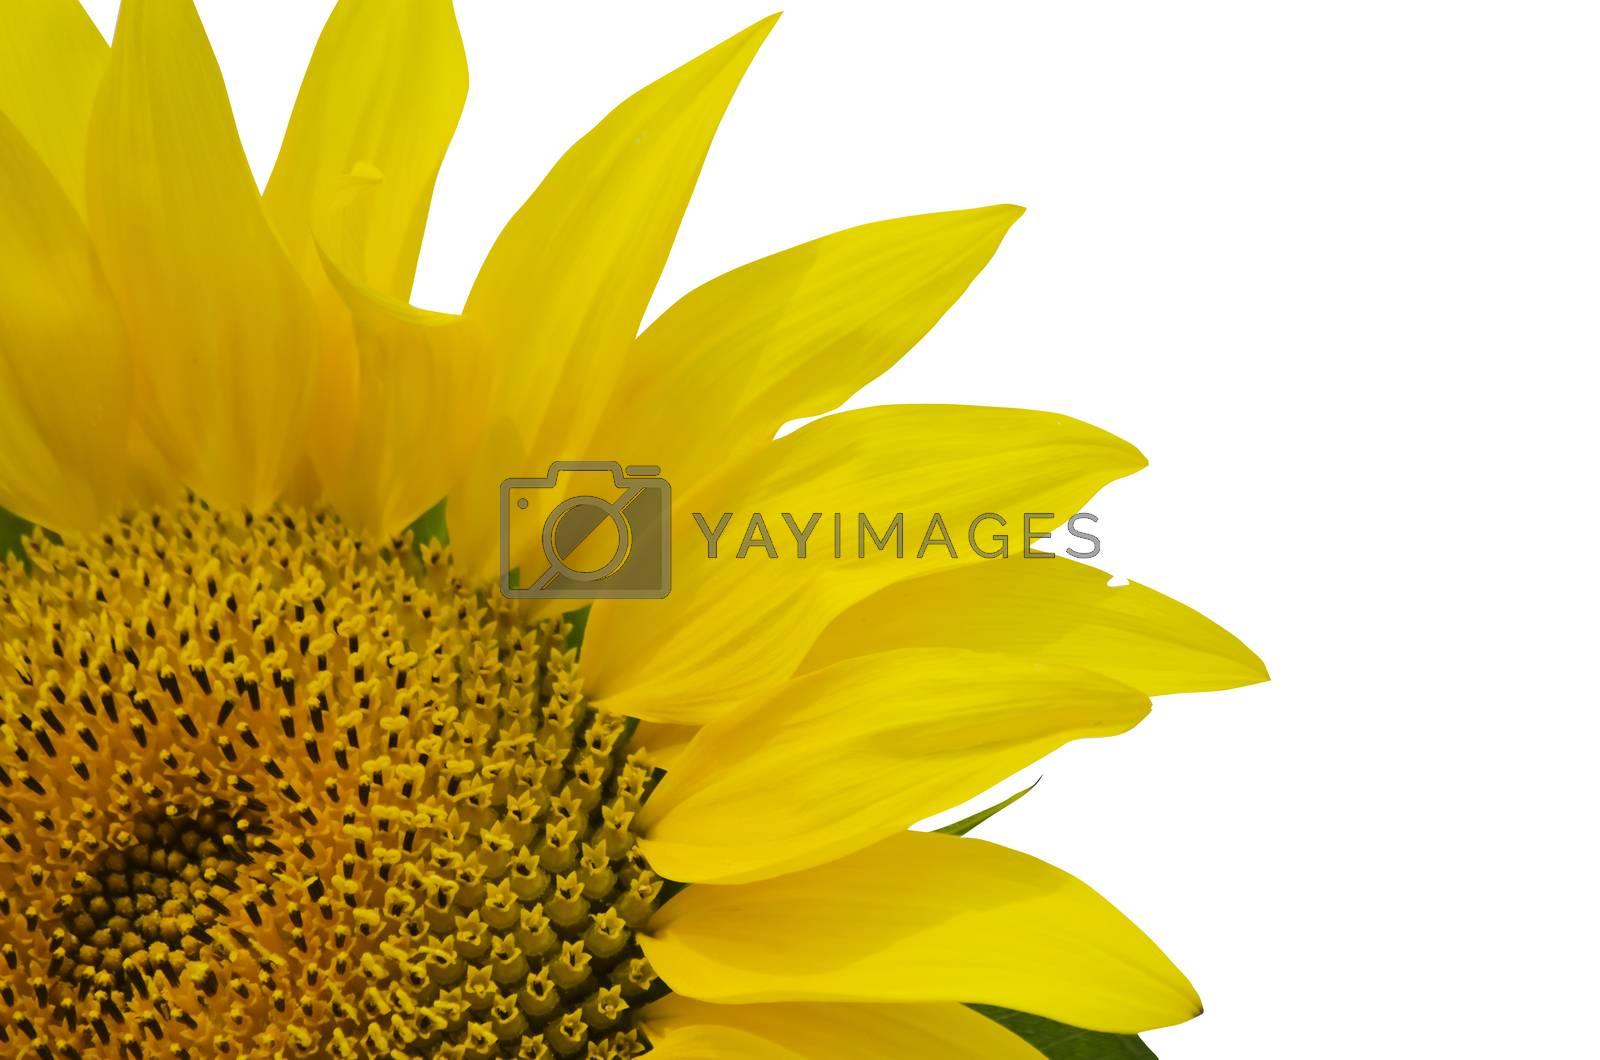 Yellow Sunflower in Summertime Over White Background